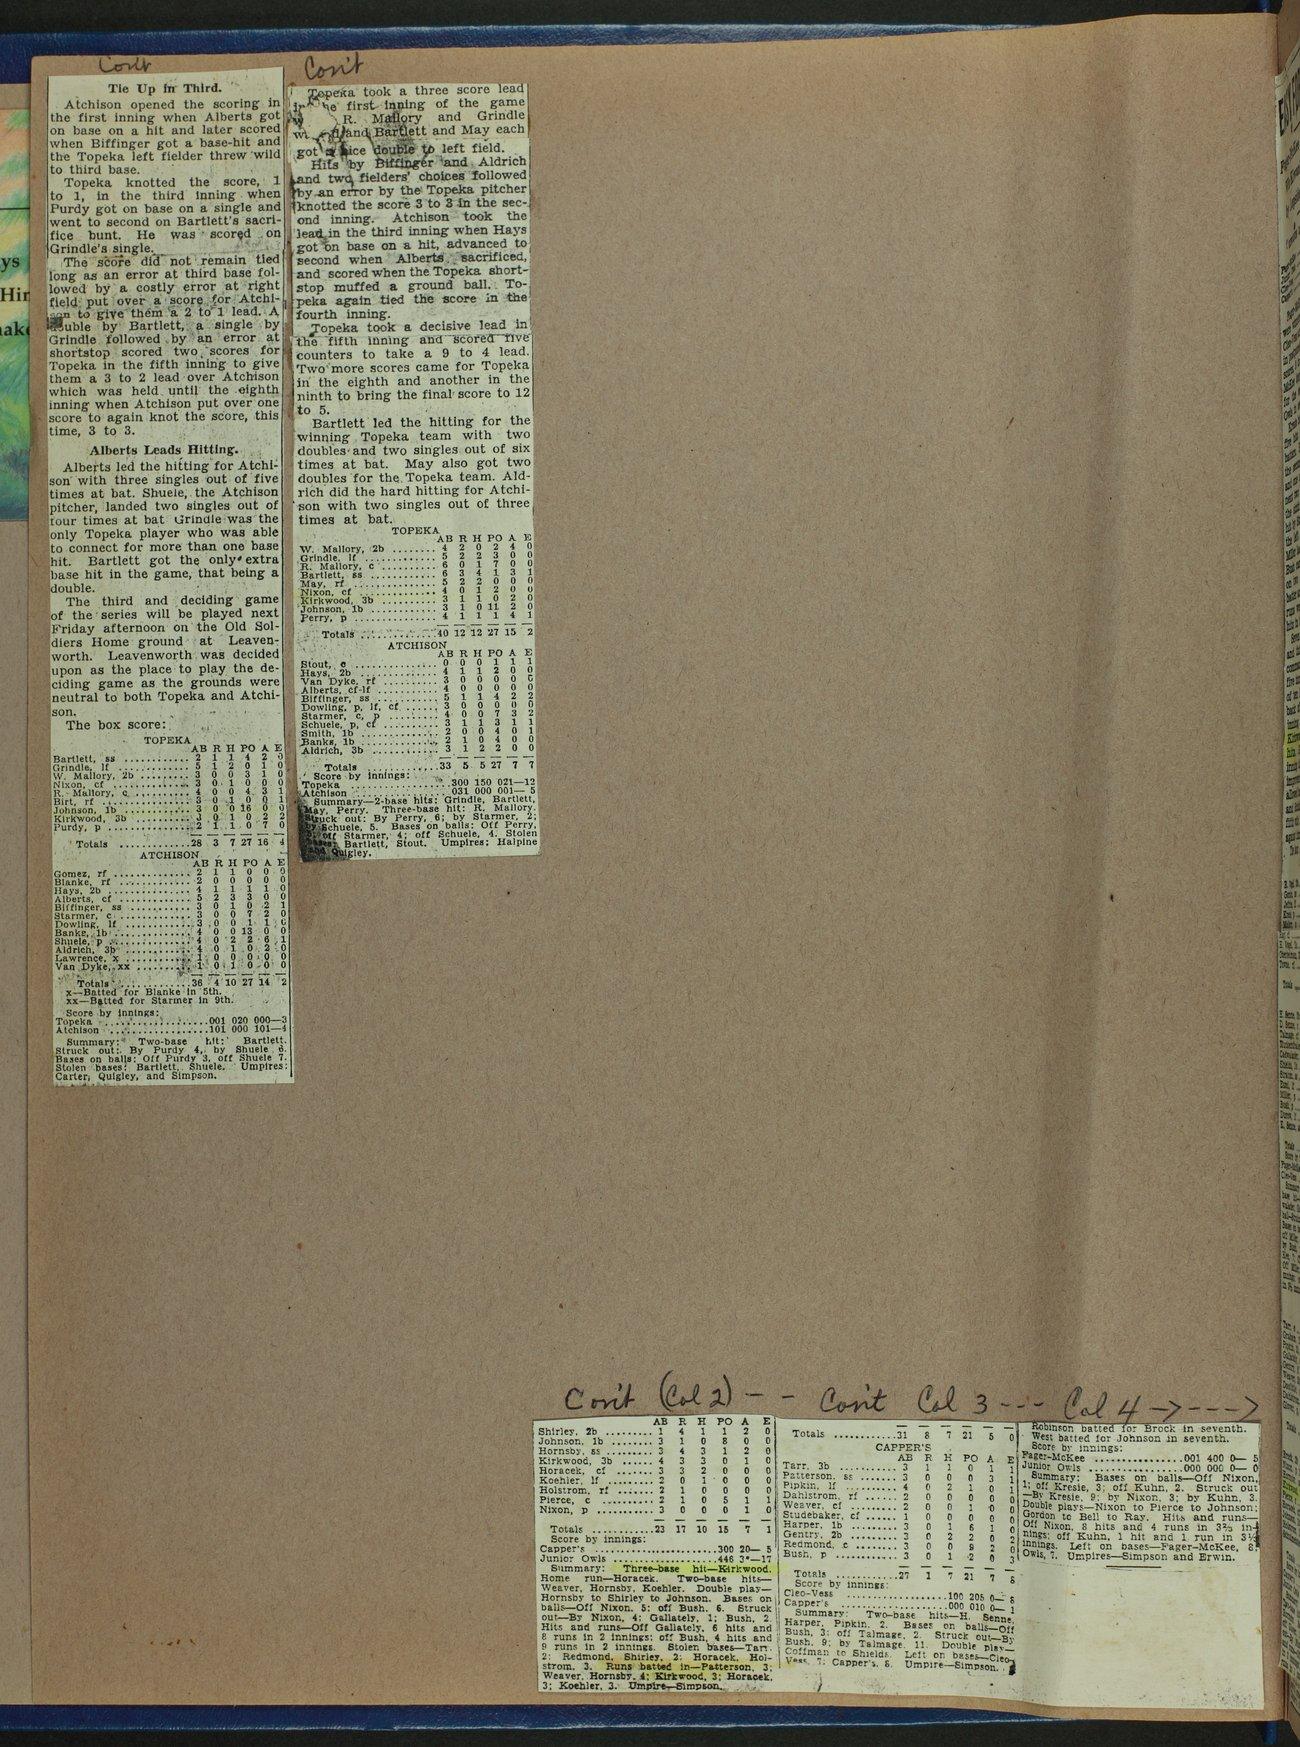 Don Kirkwood baseball scrapbook - 2